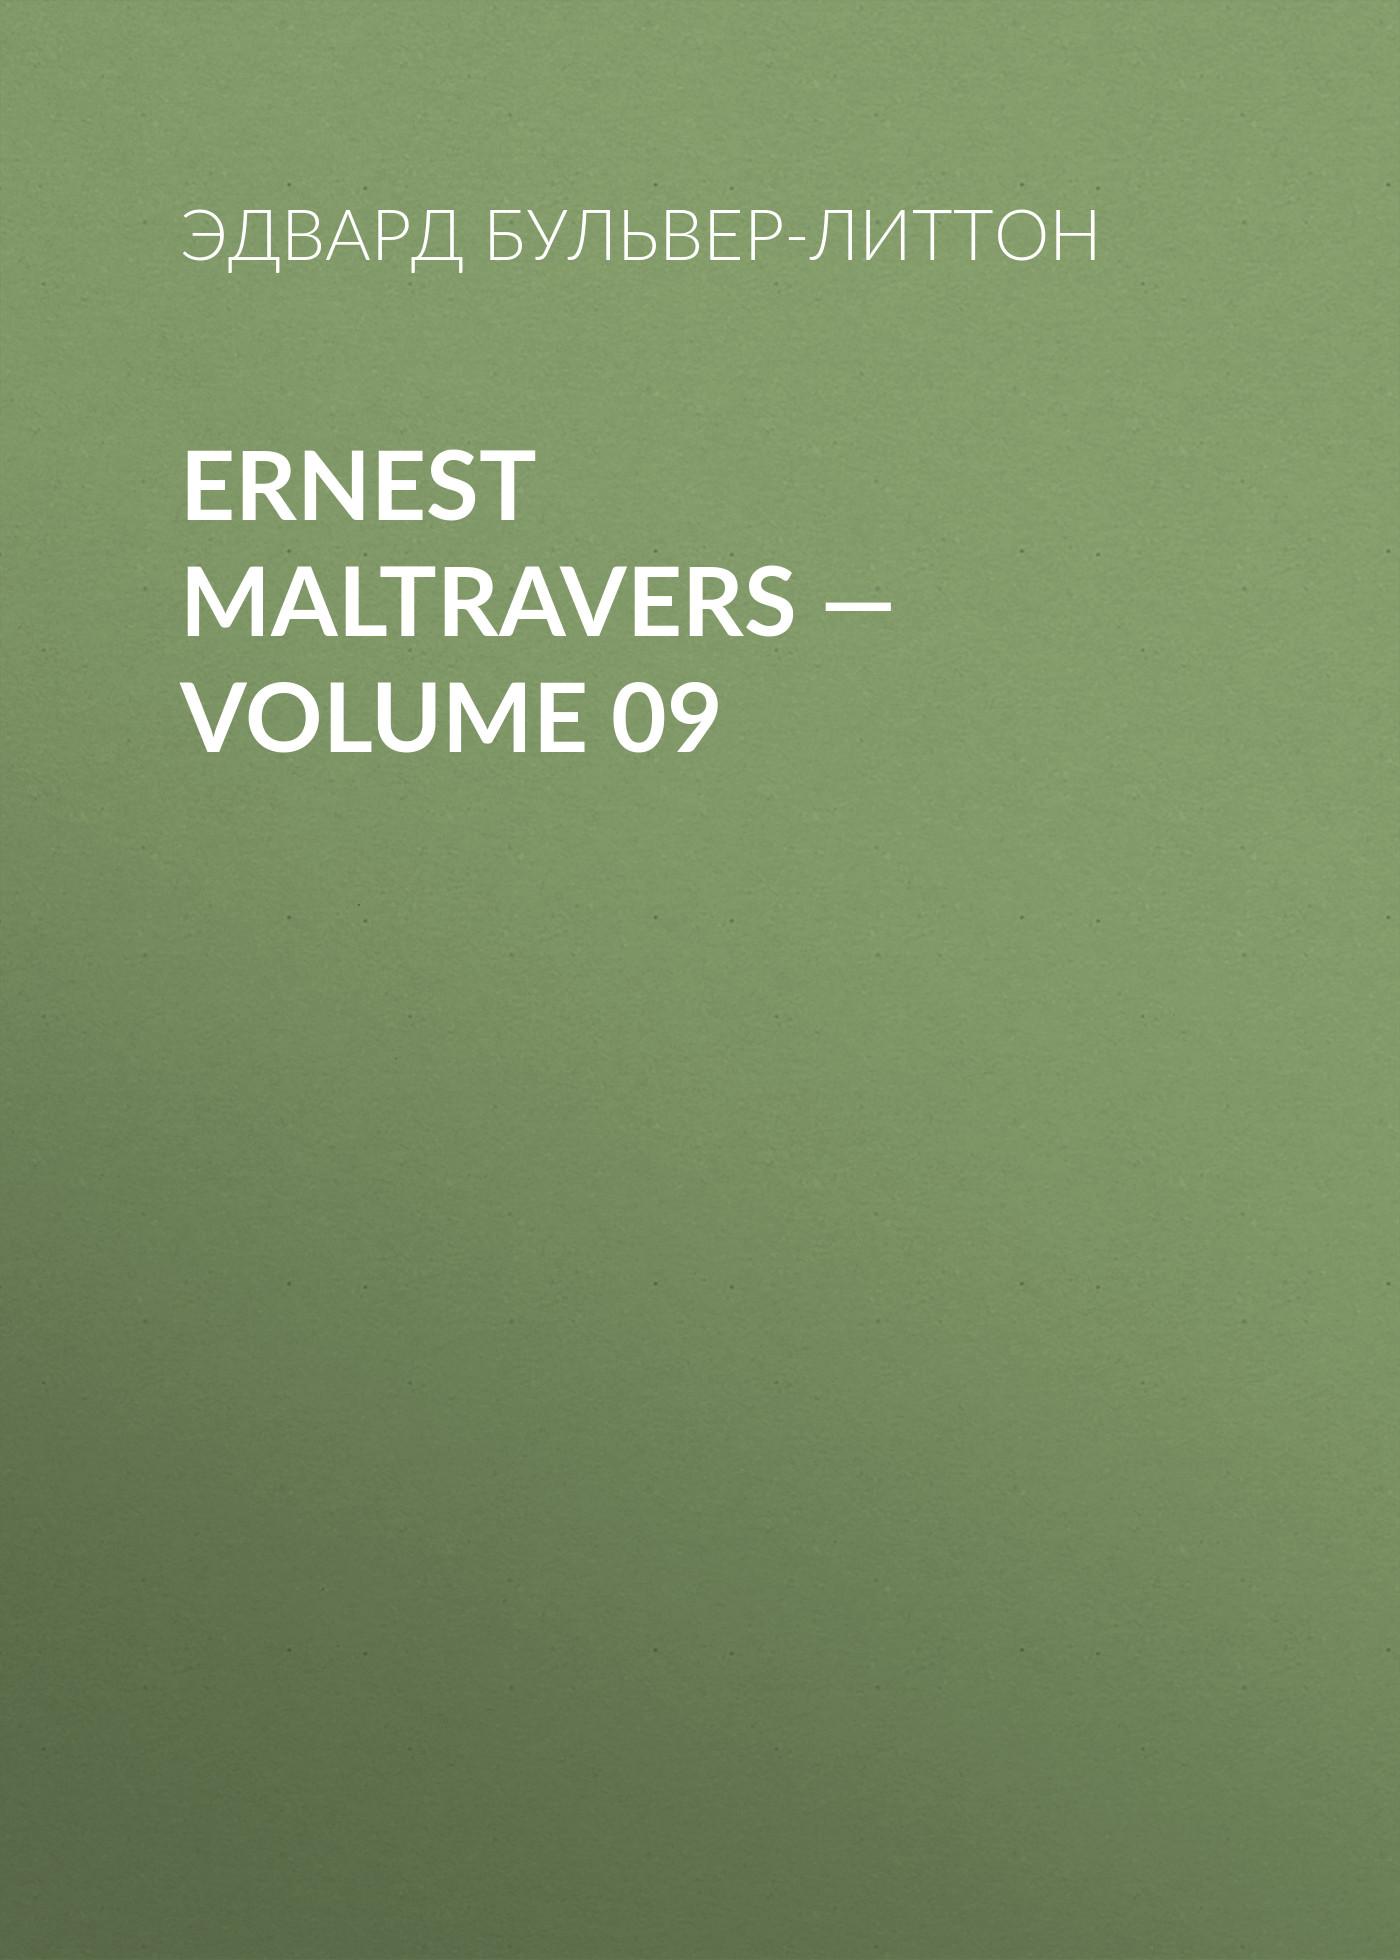 Ernest Maltravers — Volume 09